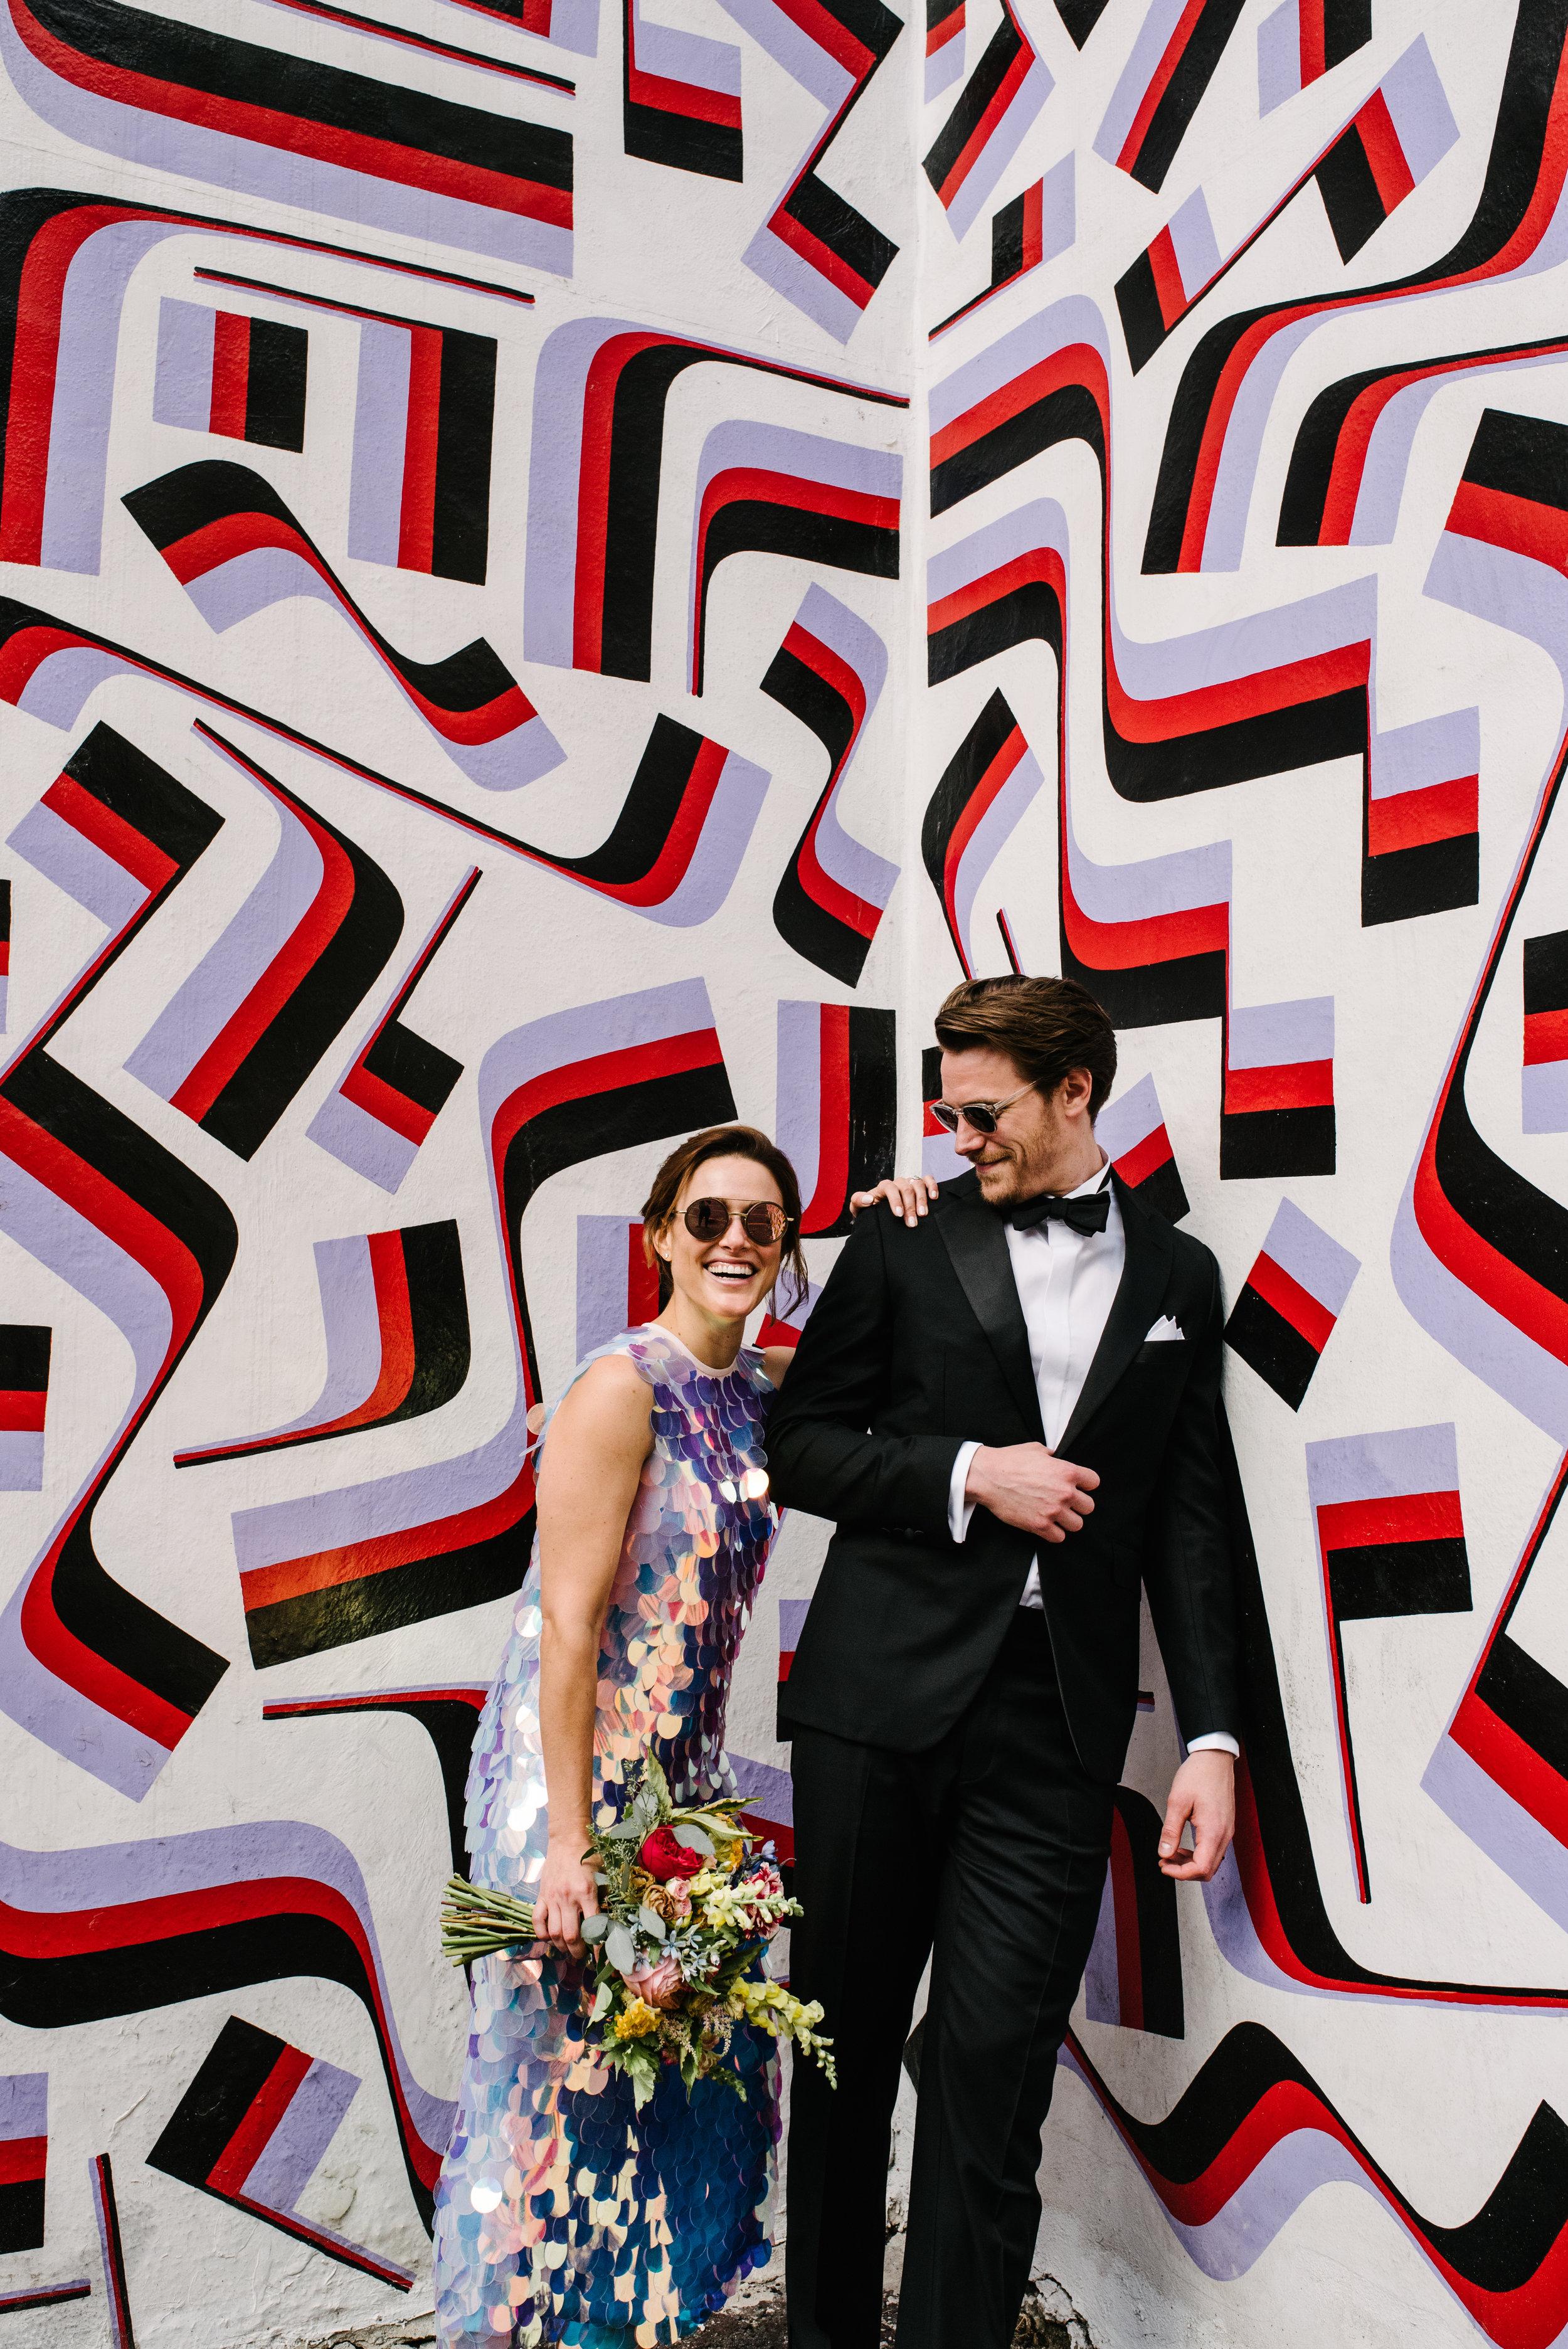 agpcollective_wedding_vernick-4567.jpg